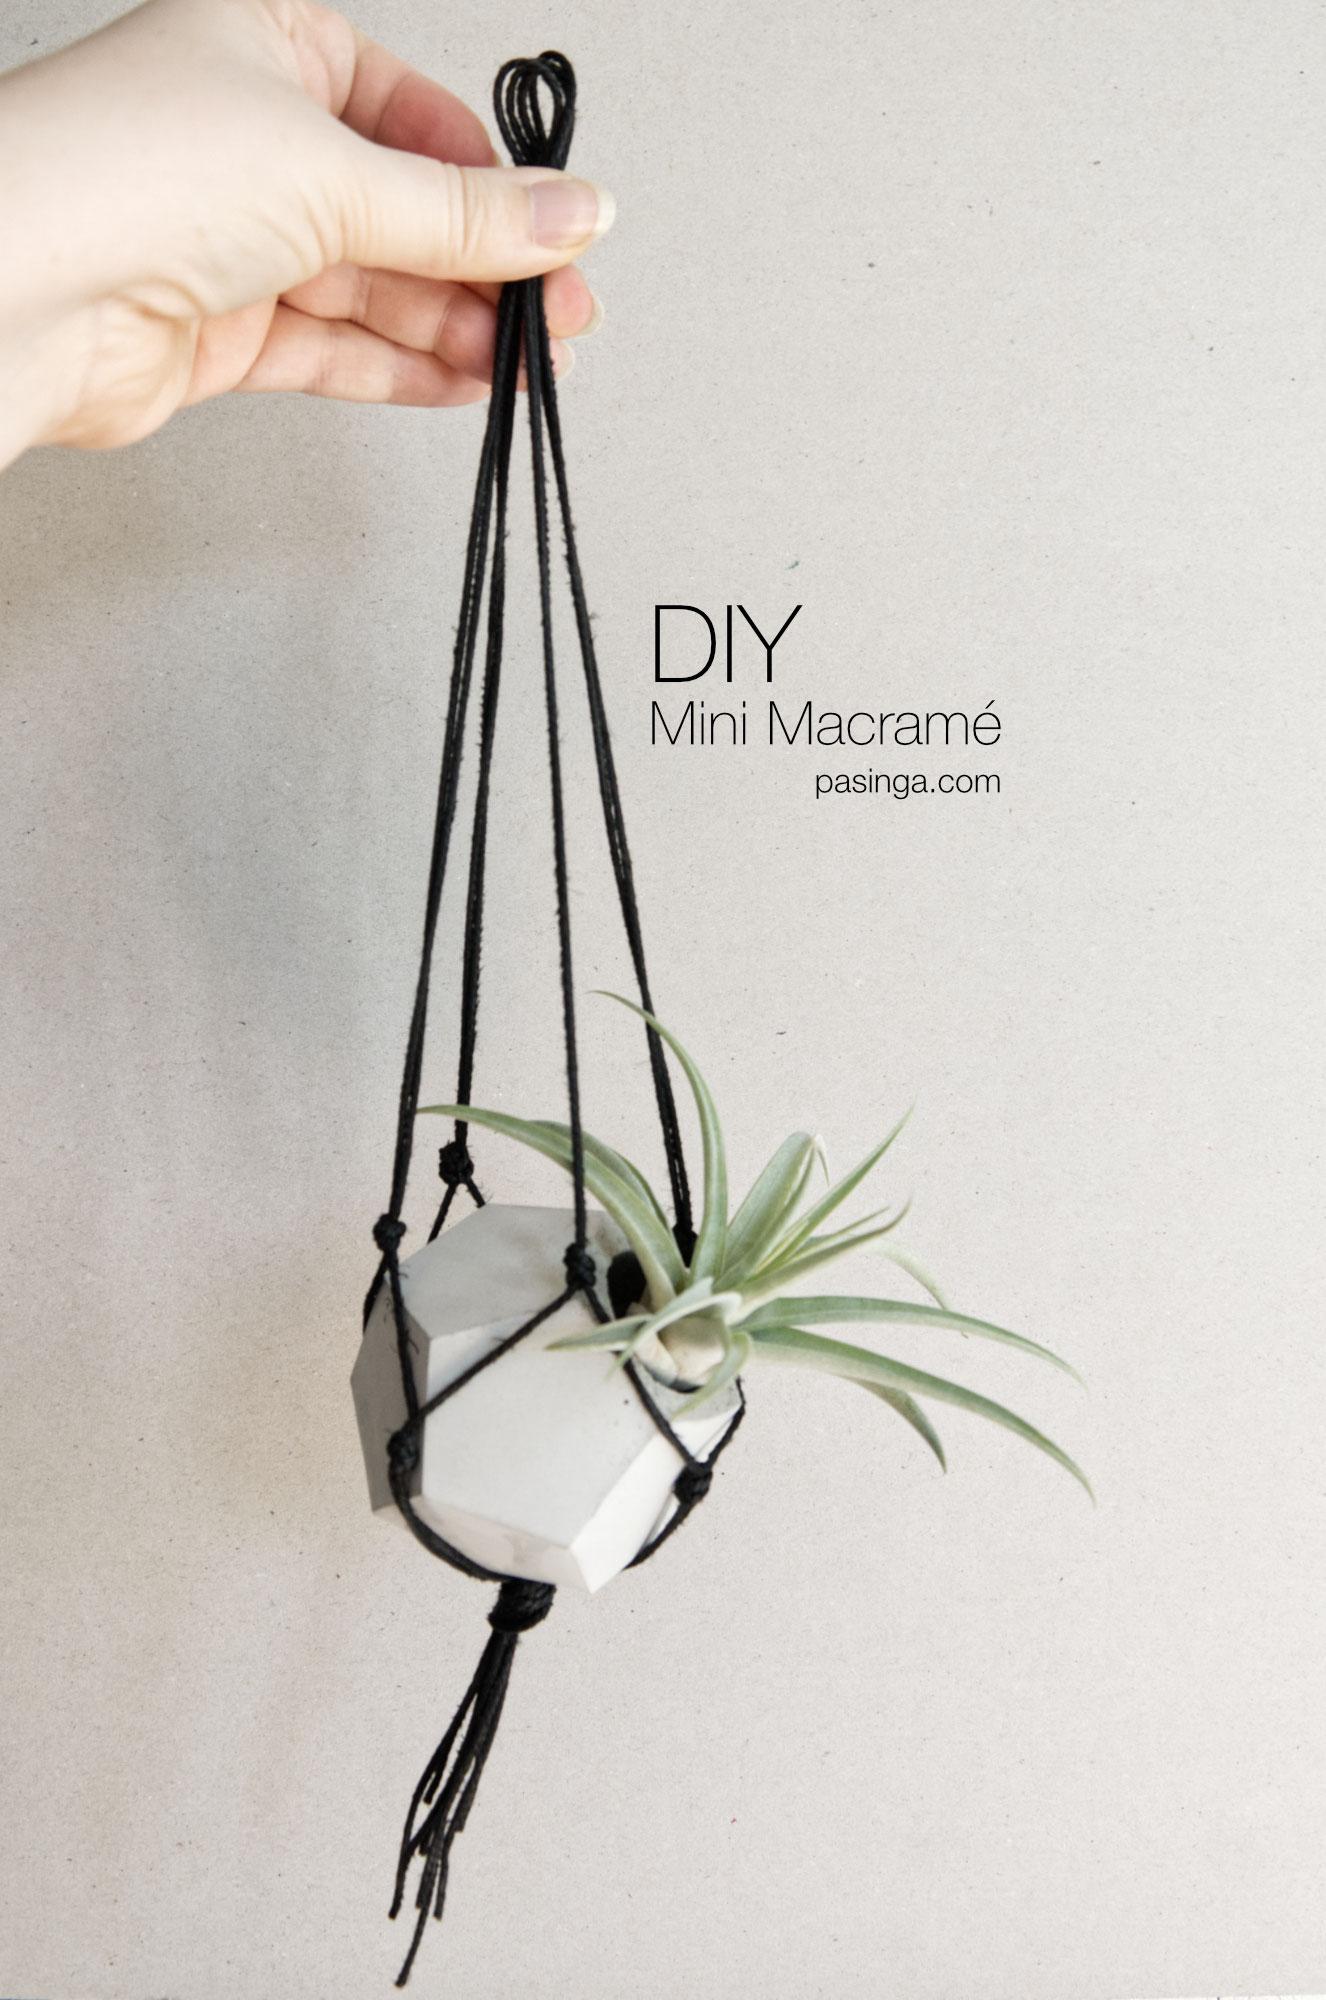 Diy Tassel Macrame Plant Hanger Pasinga Photographs Design